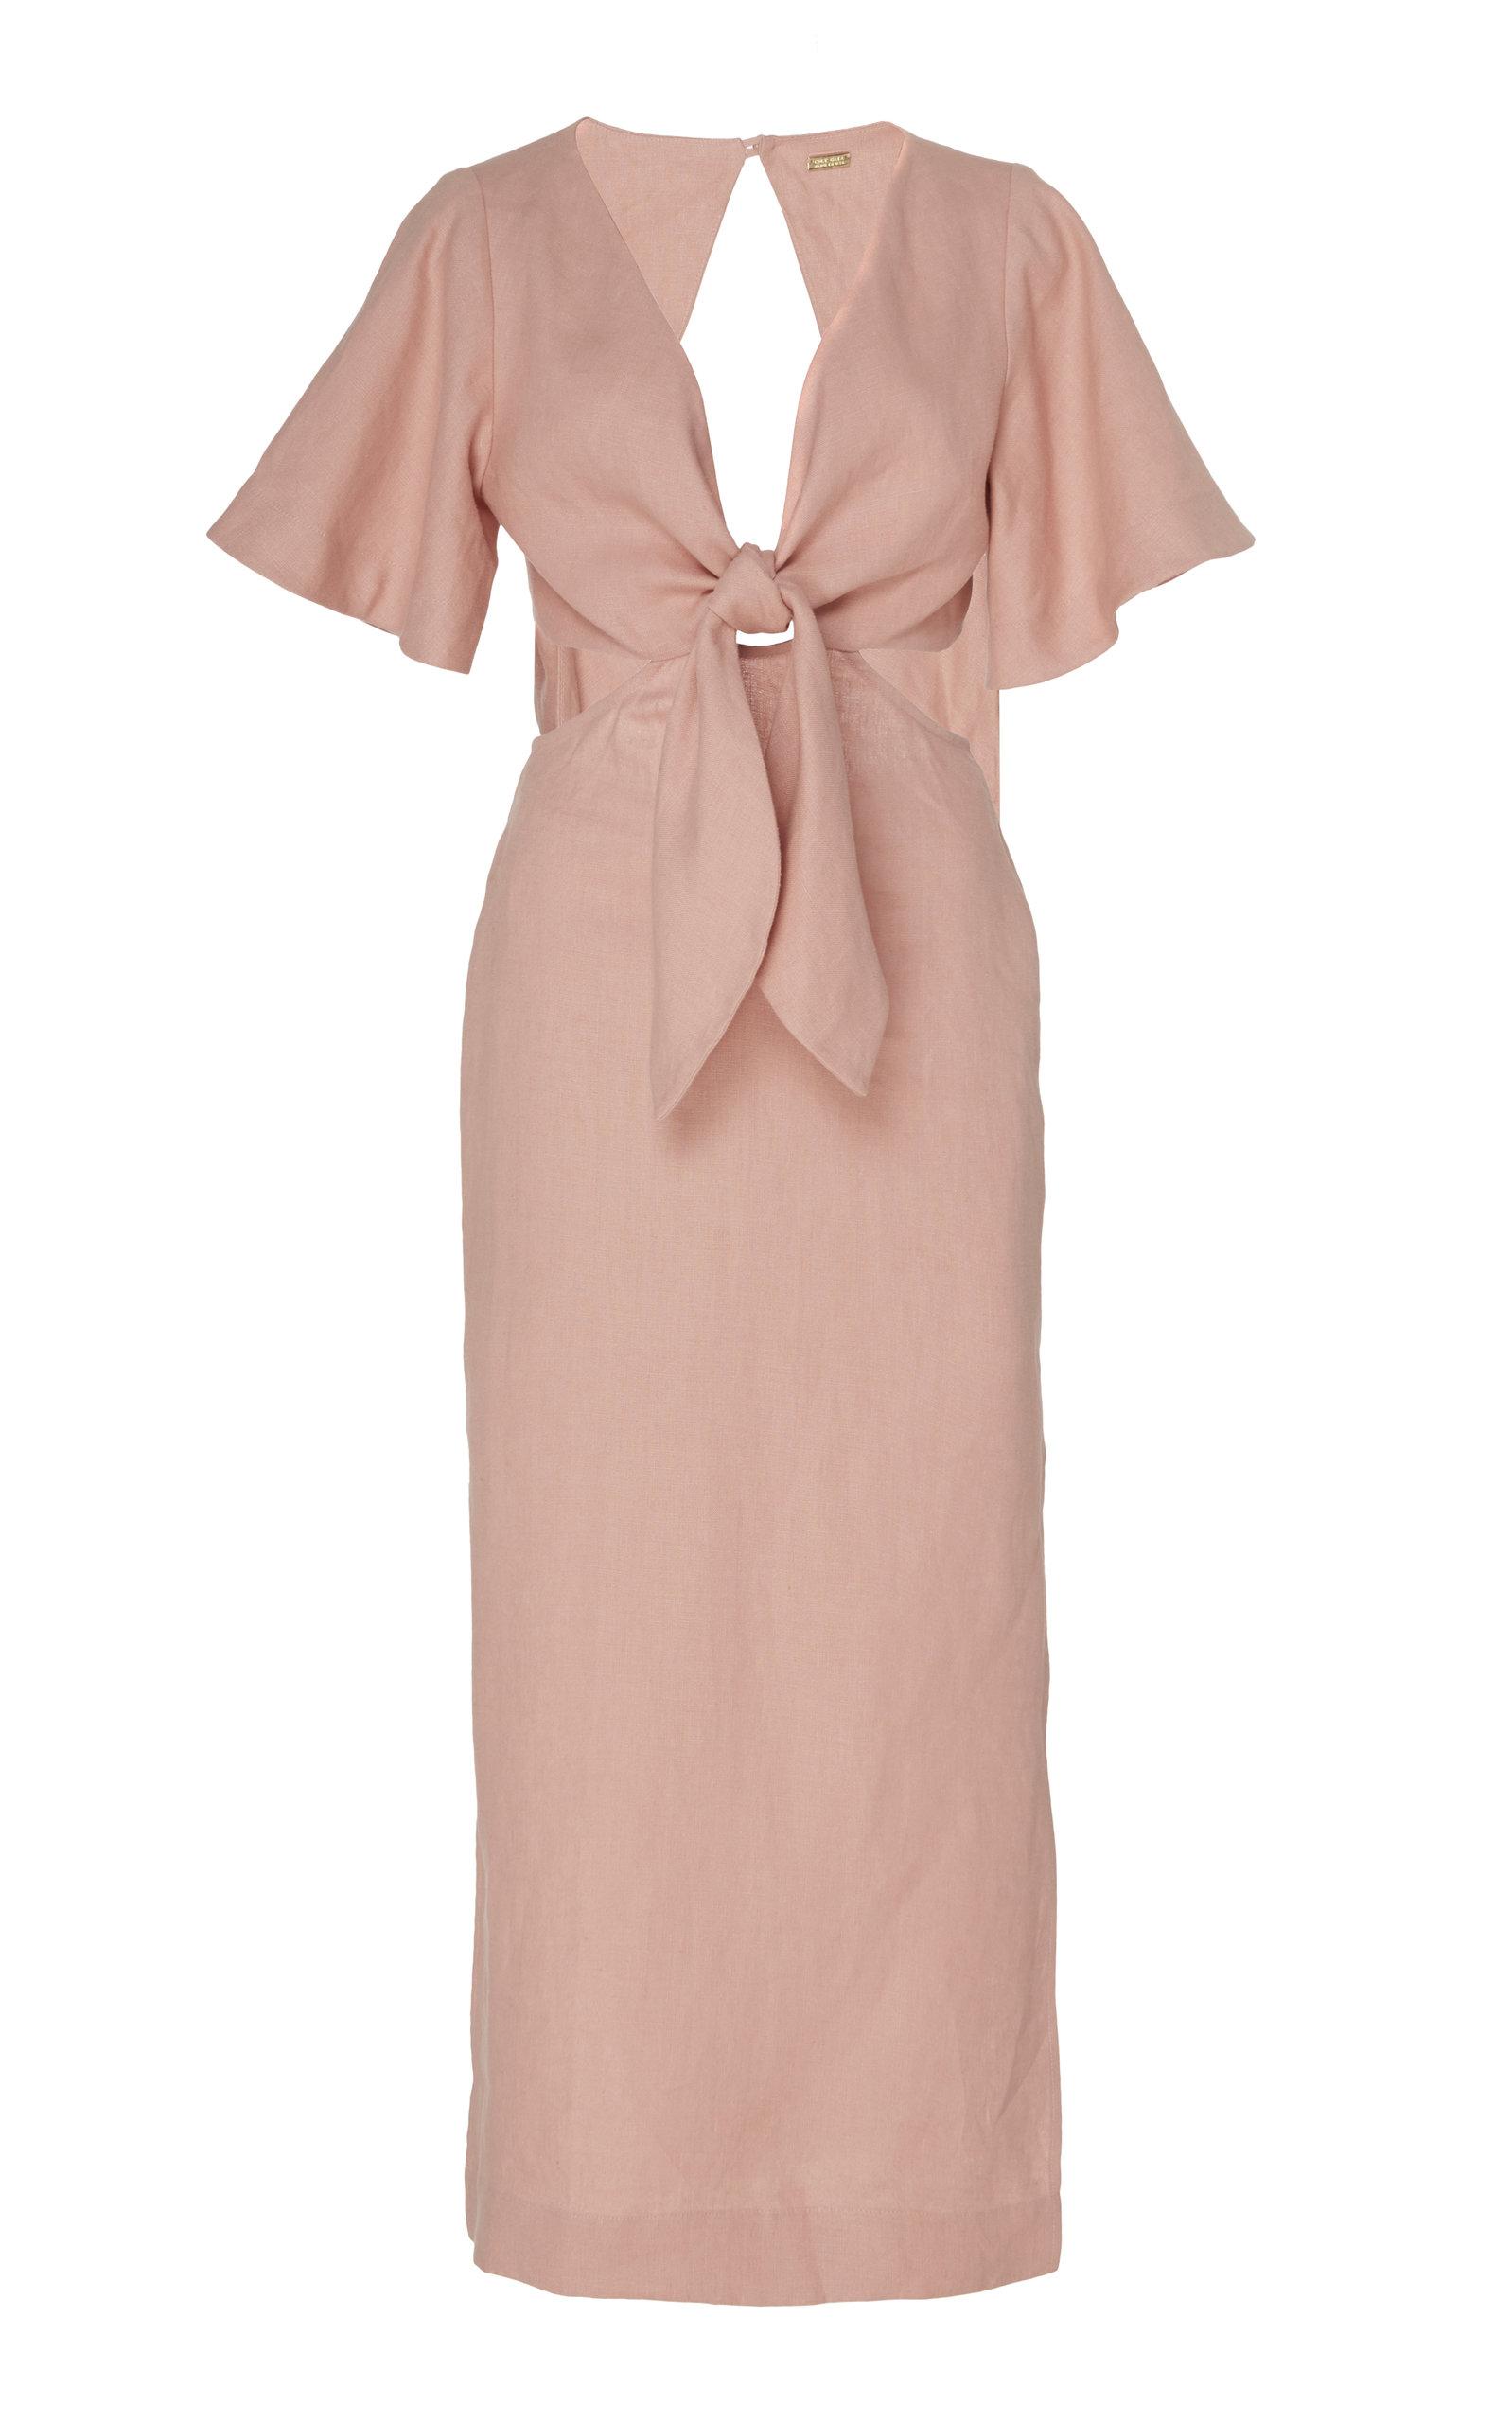 Buy Cult Gaia Maya Cutout Linen Midi Dress online, shop Cult Gaia at the best price